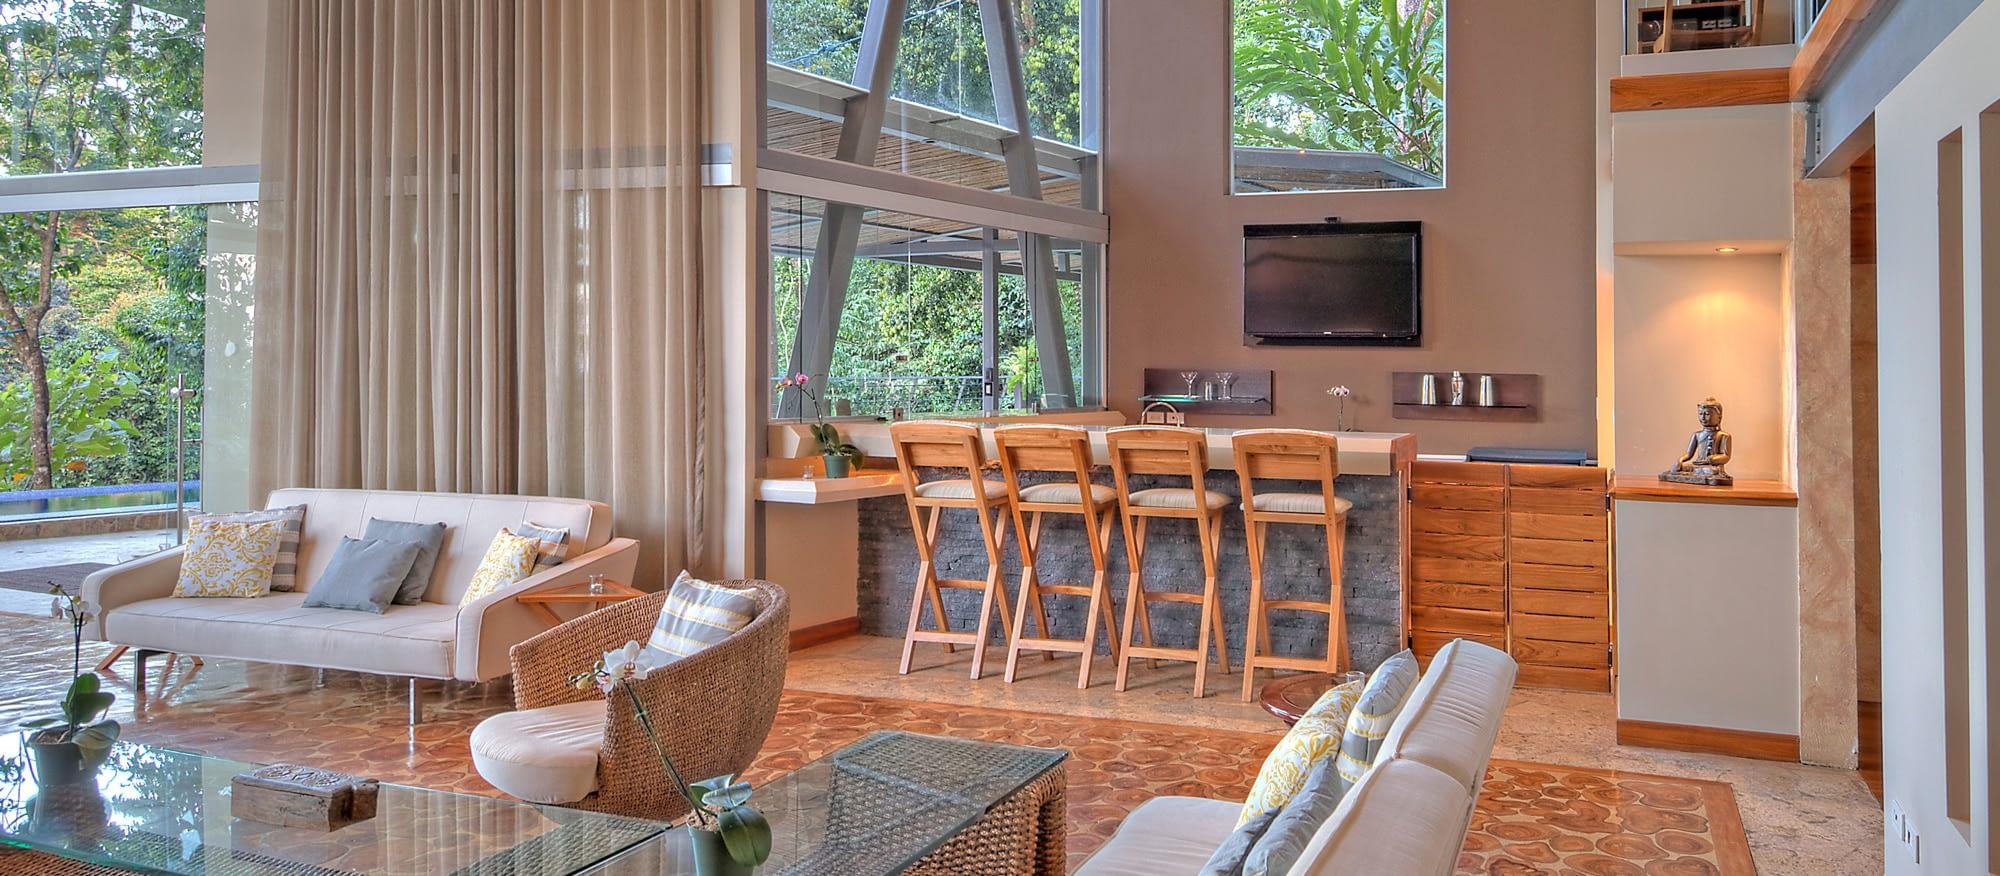 social areas for private group villas in costa rica